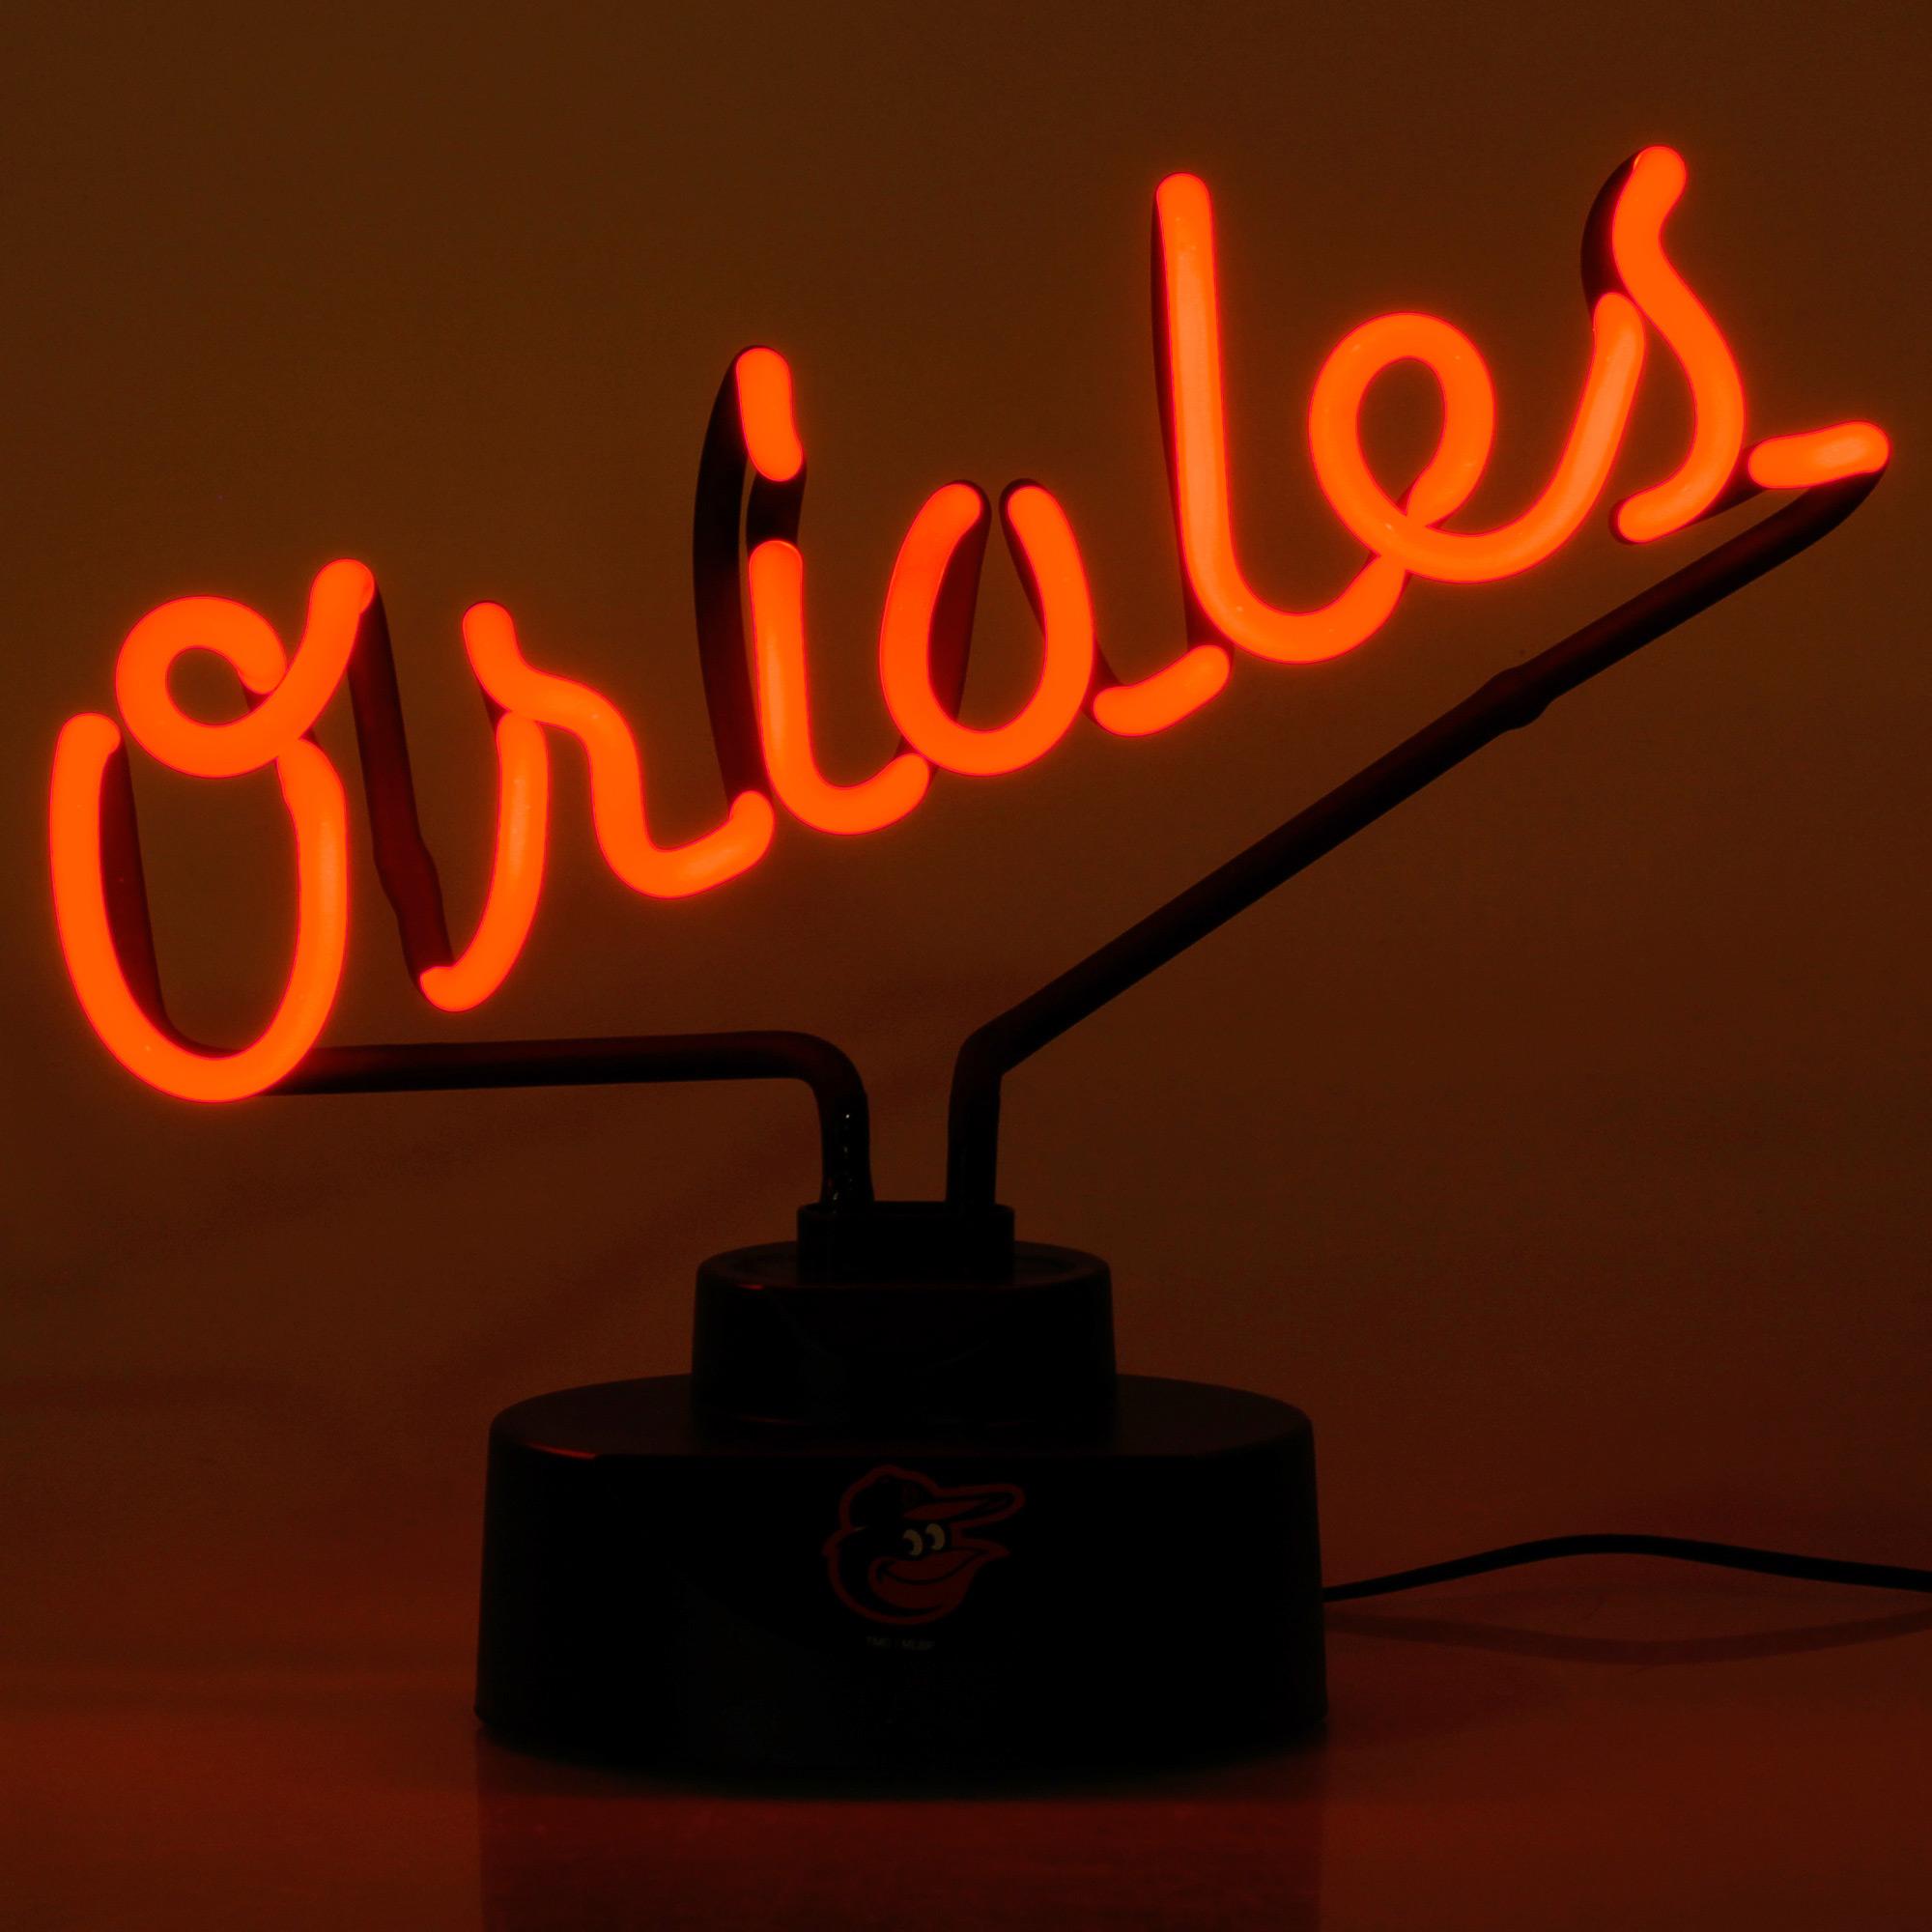 Baltimore Orioles Script Neon Light - No Size